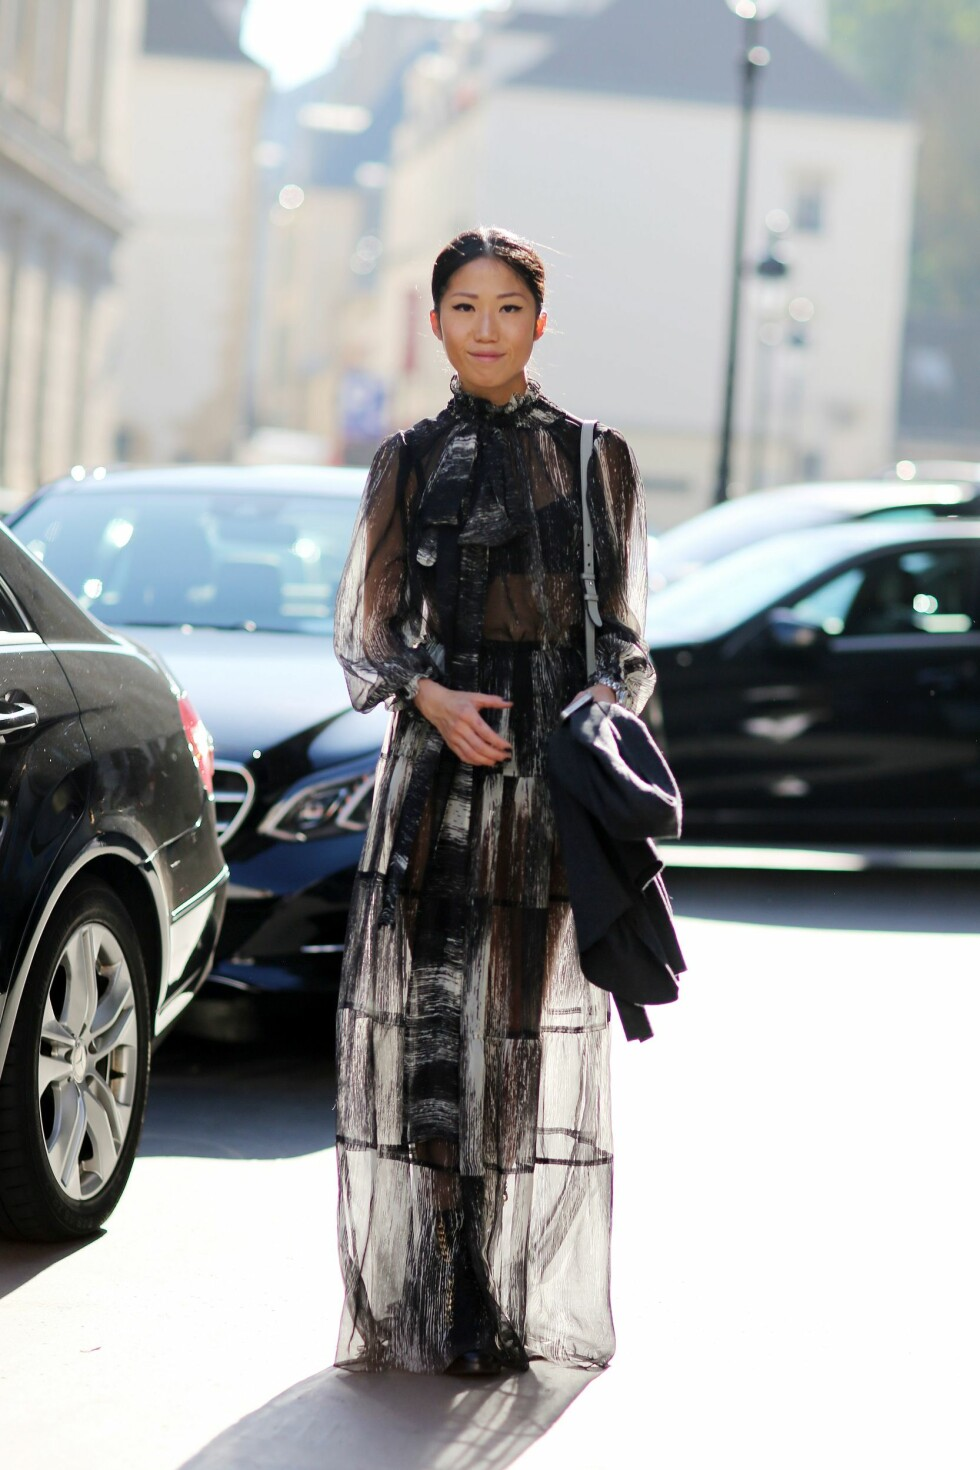 En mønstret, transparent kjole med synlig undertøy under.  Foto: All Over